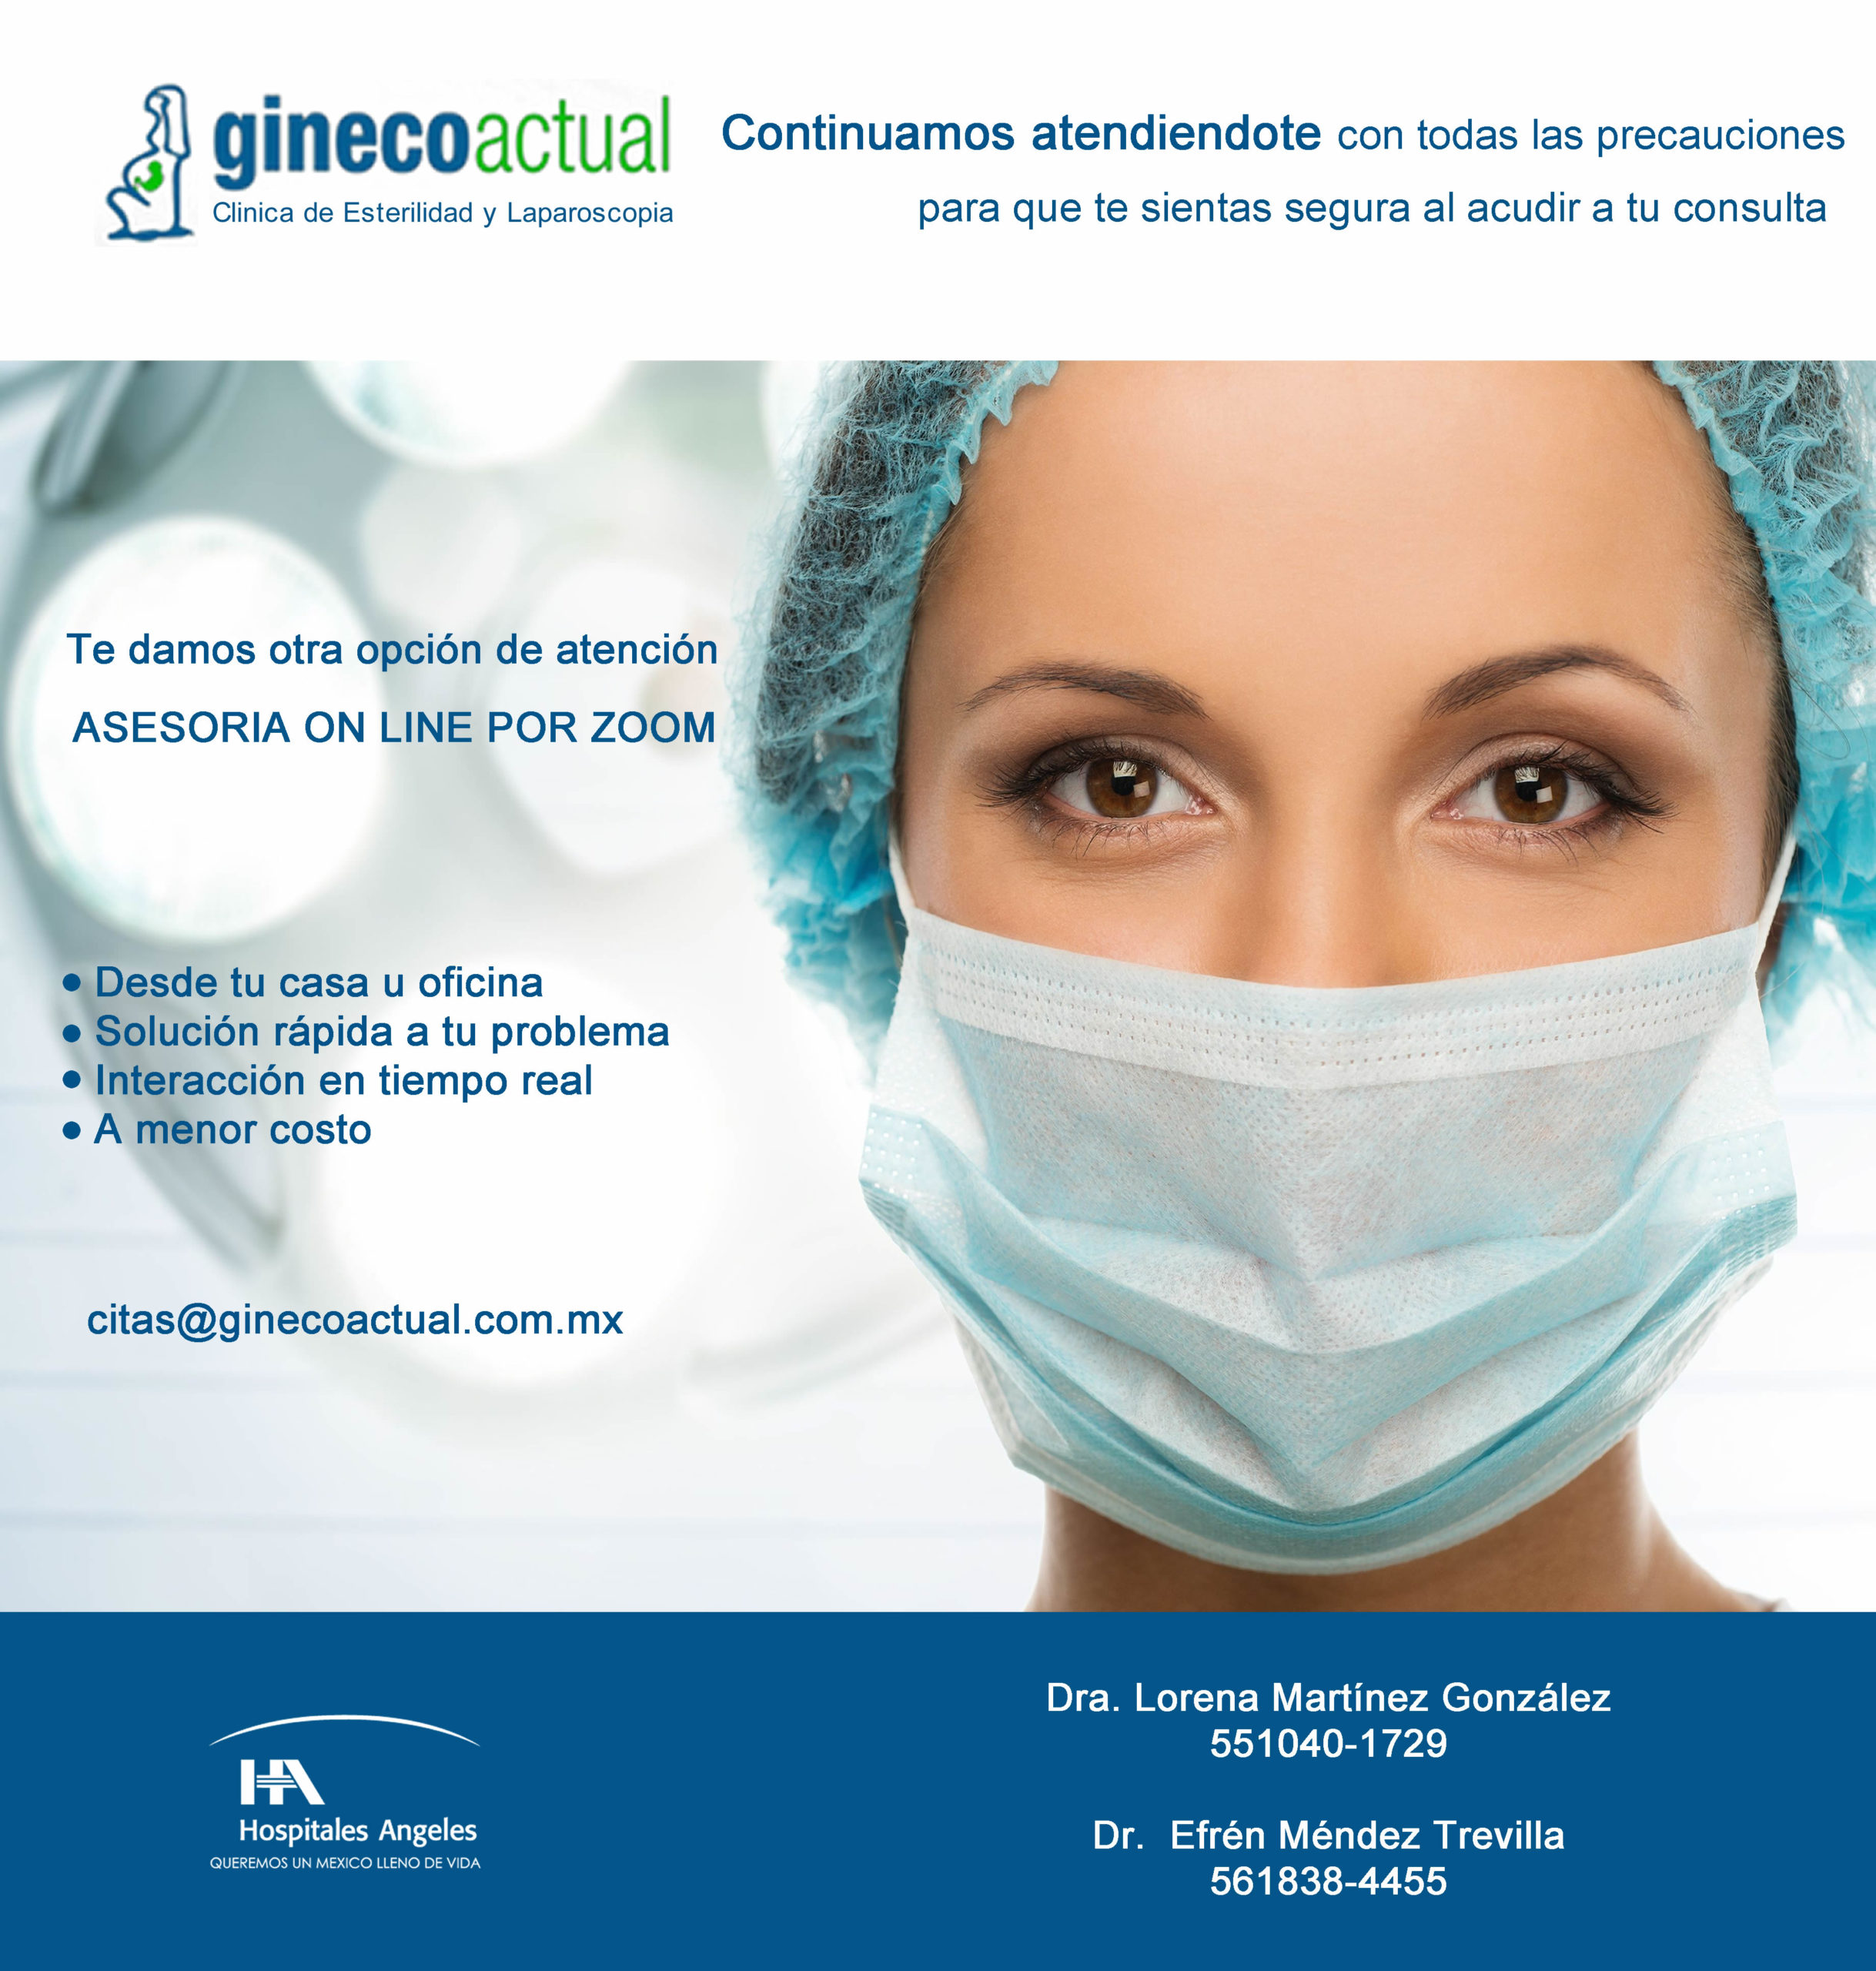 ginecoactual.com.mx